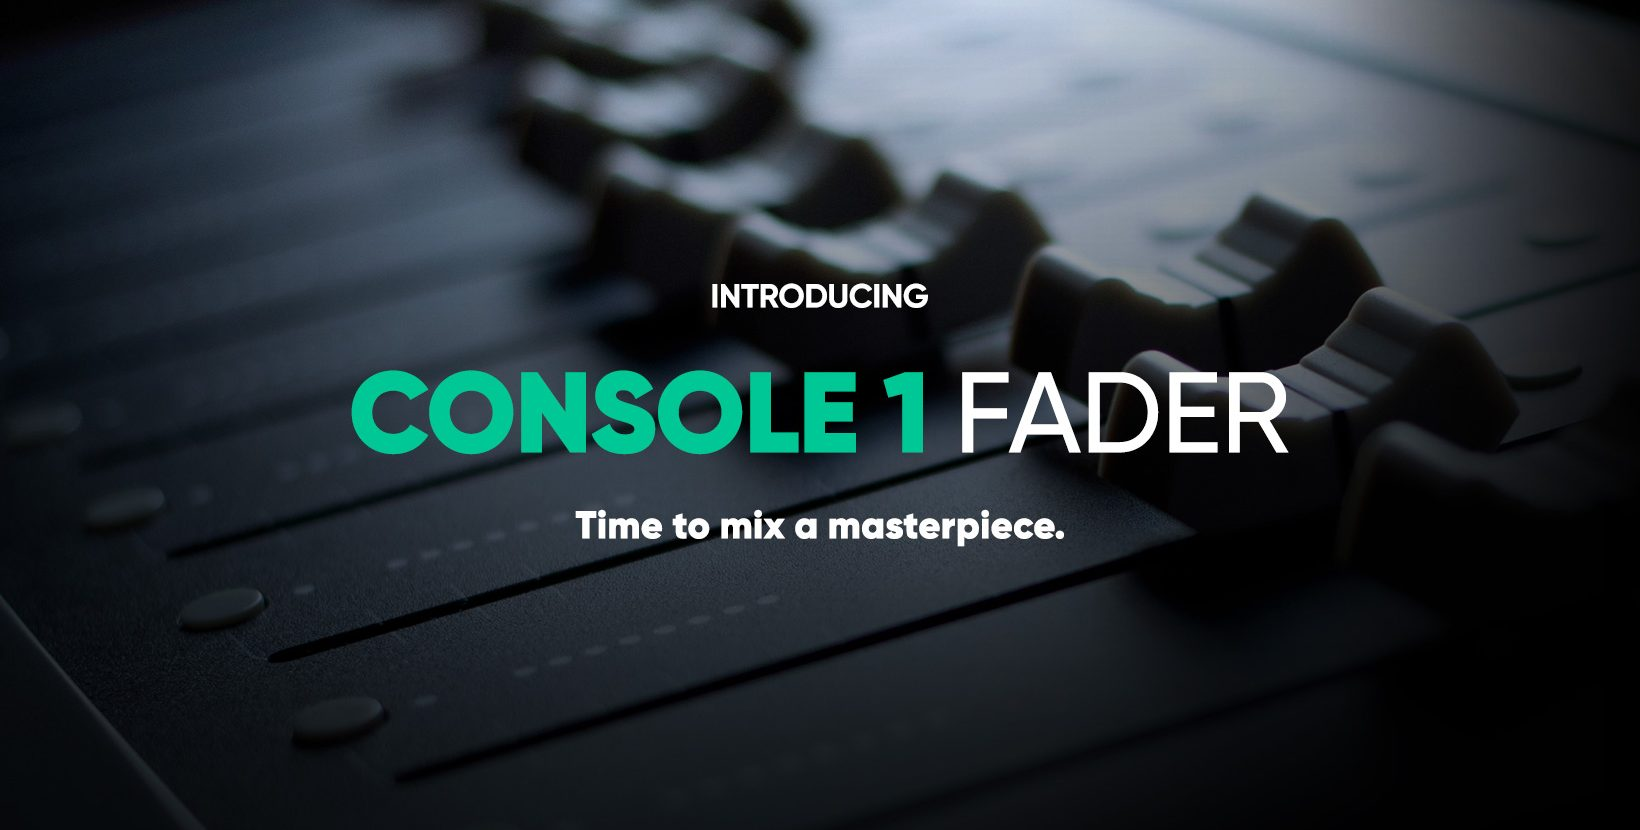 CONSOLE 1 FADER